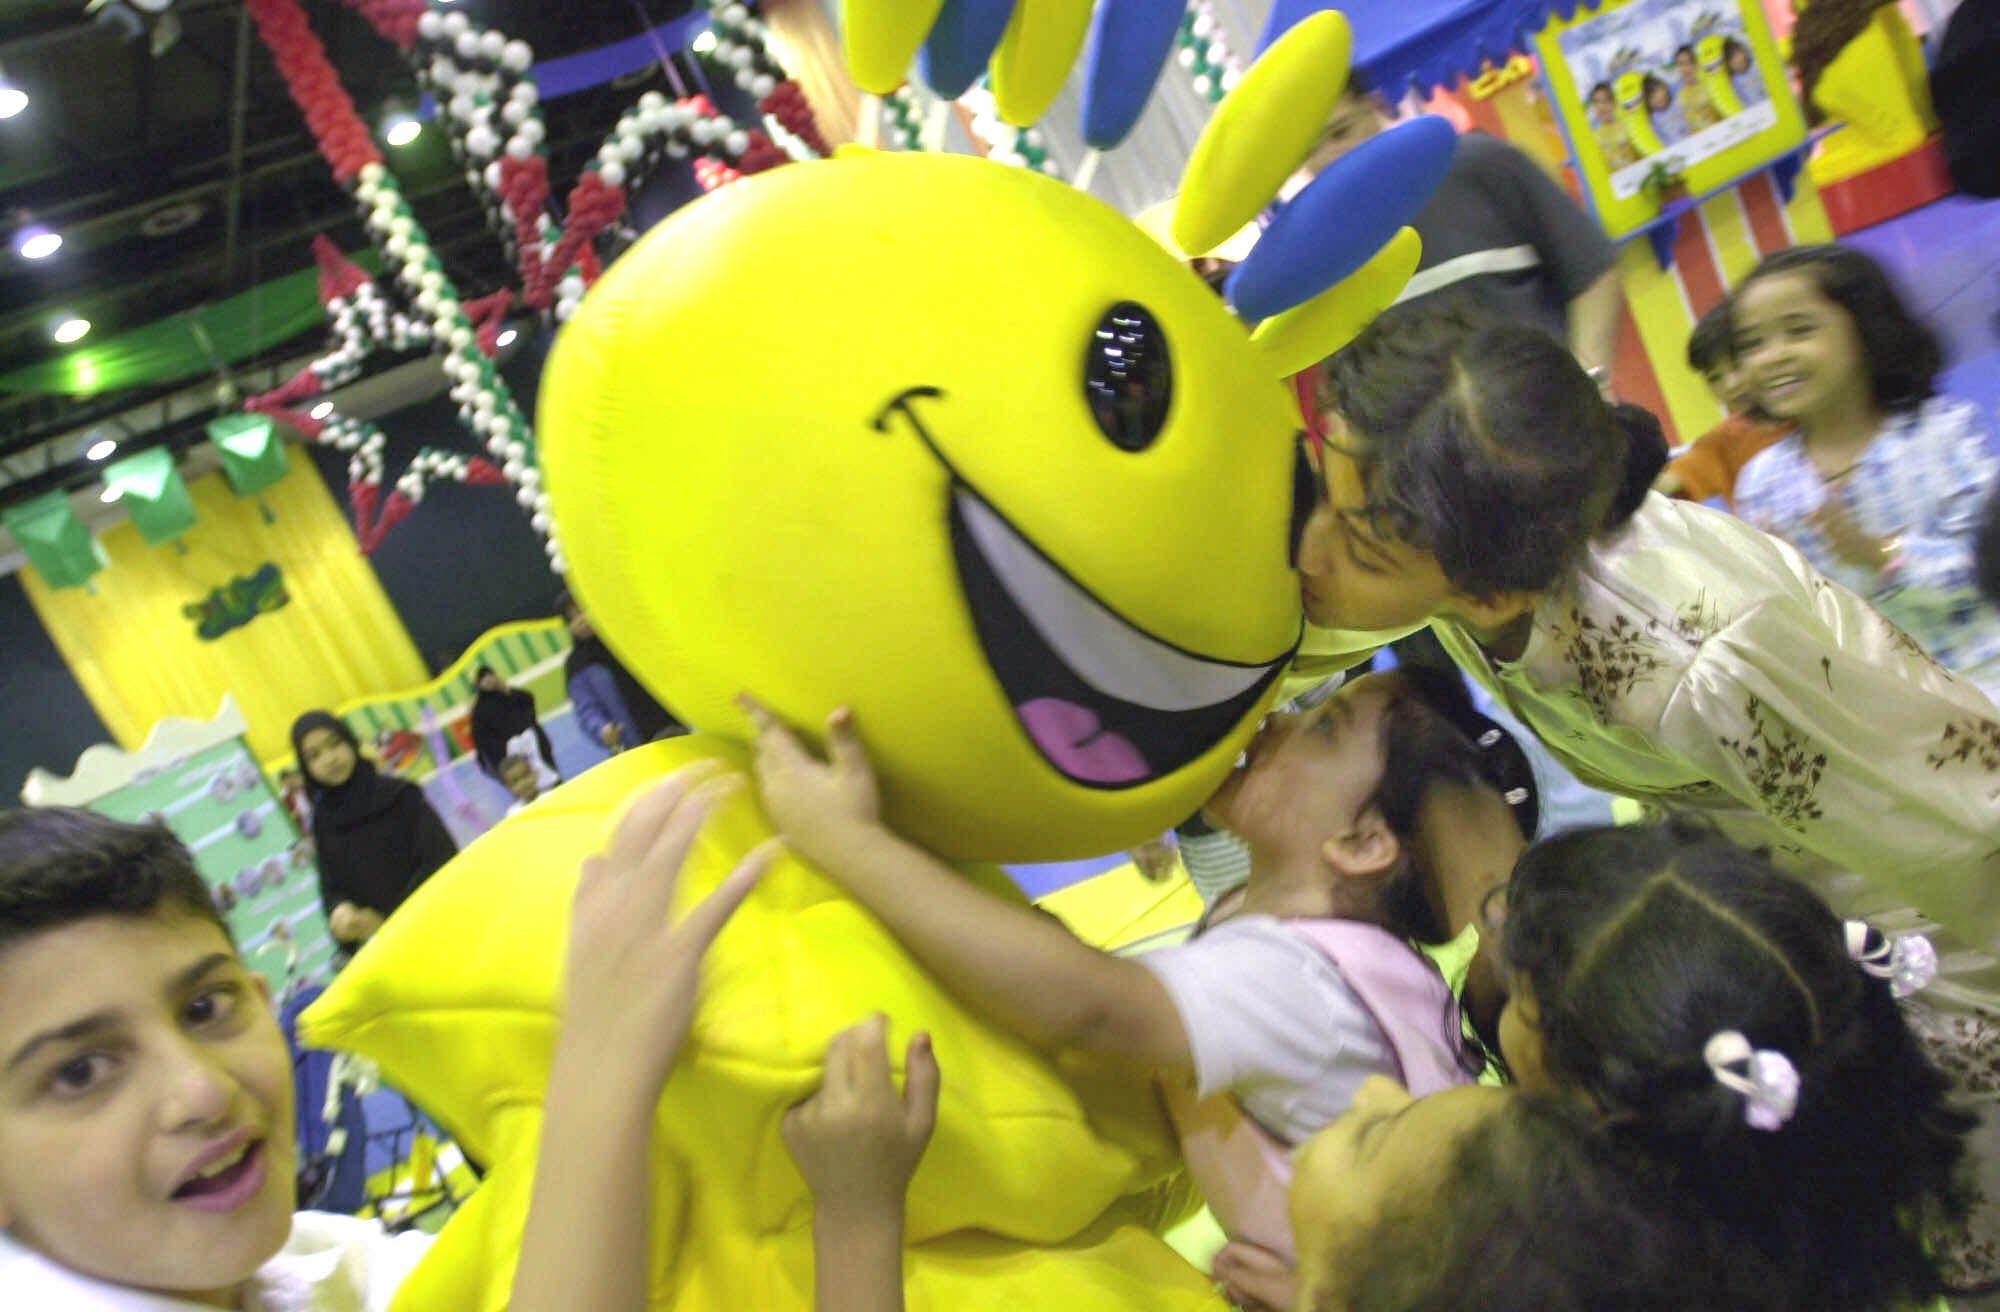 Arab children playing with Modhesh, the cartoon character at the Modhesh Fun City during Dubai Summer Surprises (File photo: AP)